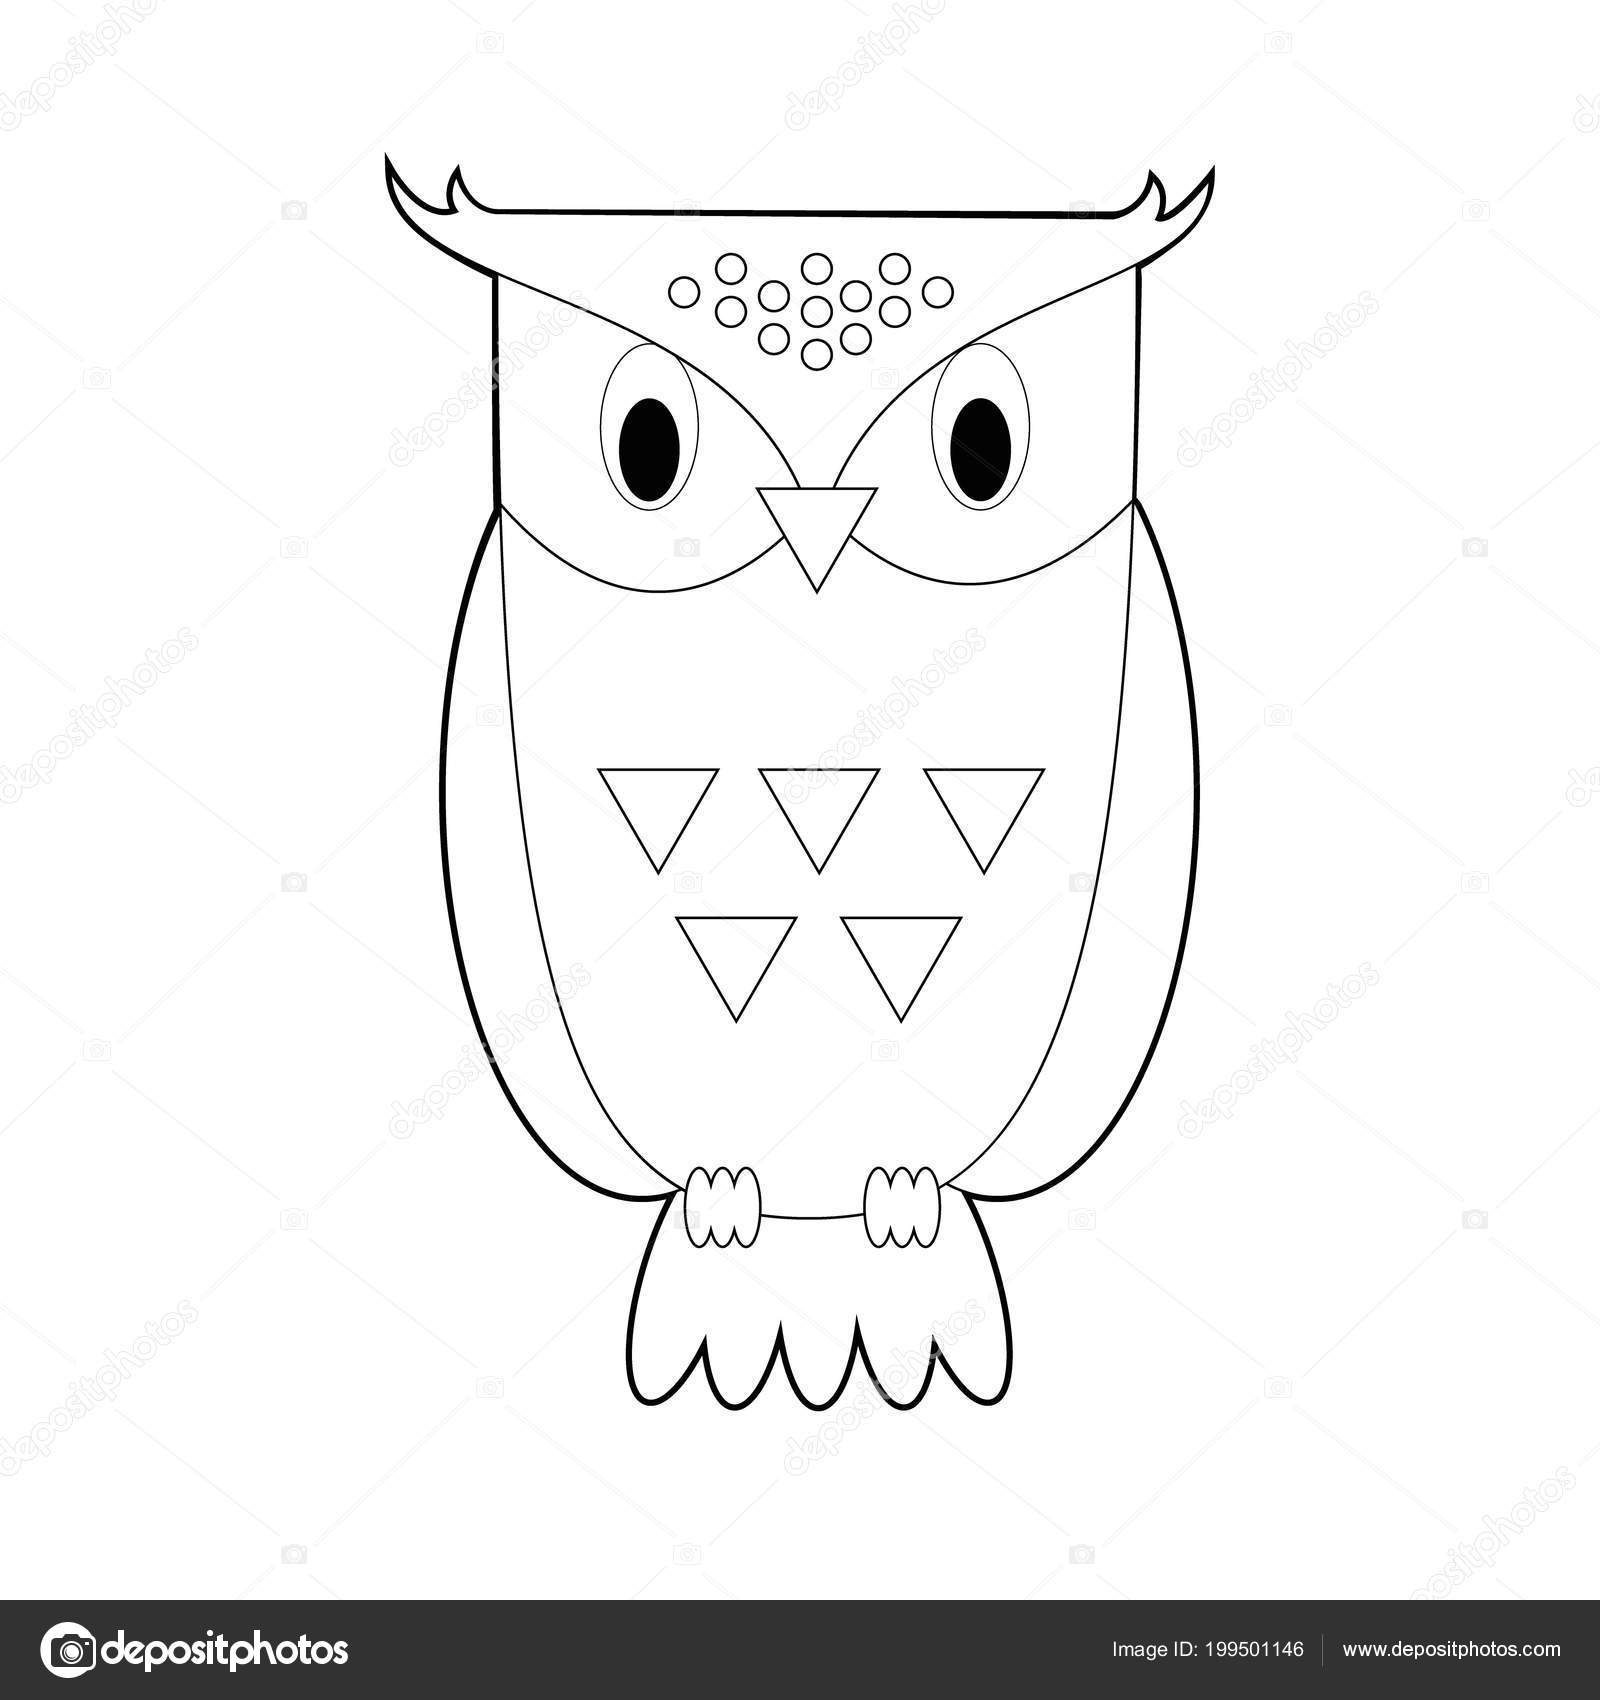 Dibujos Faciles De Sabiduria Facil Para Colorear Dibujos Animales